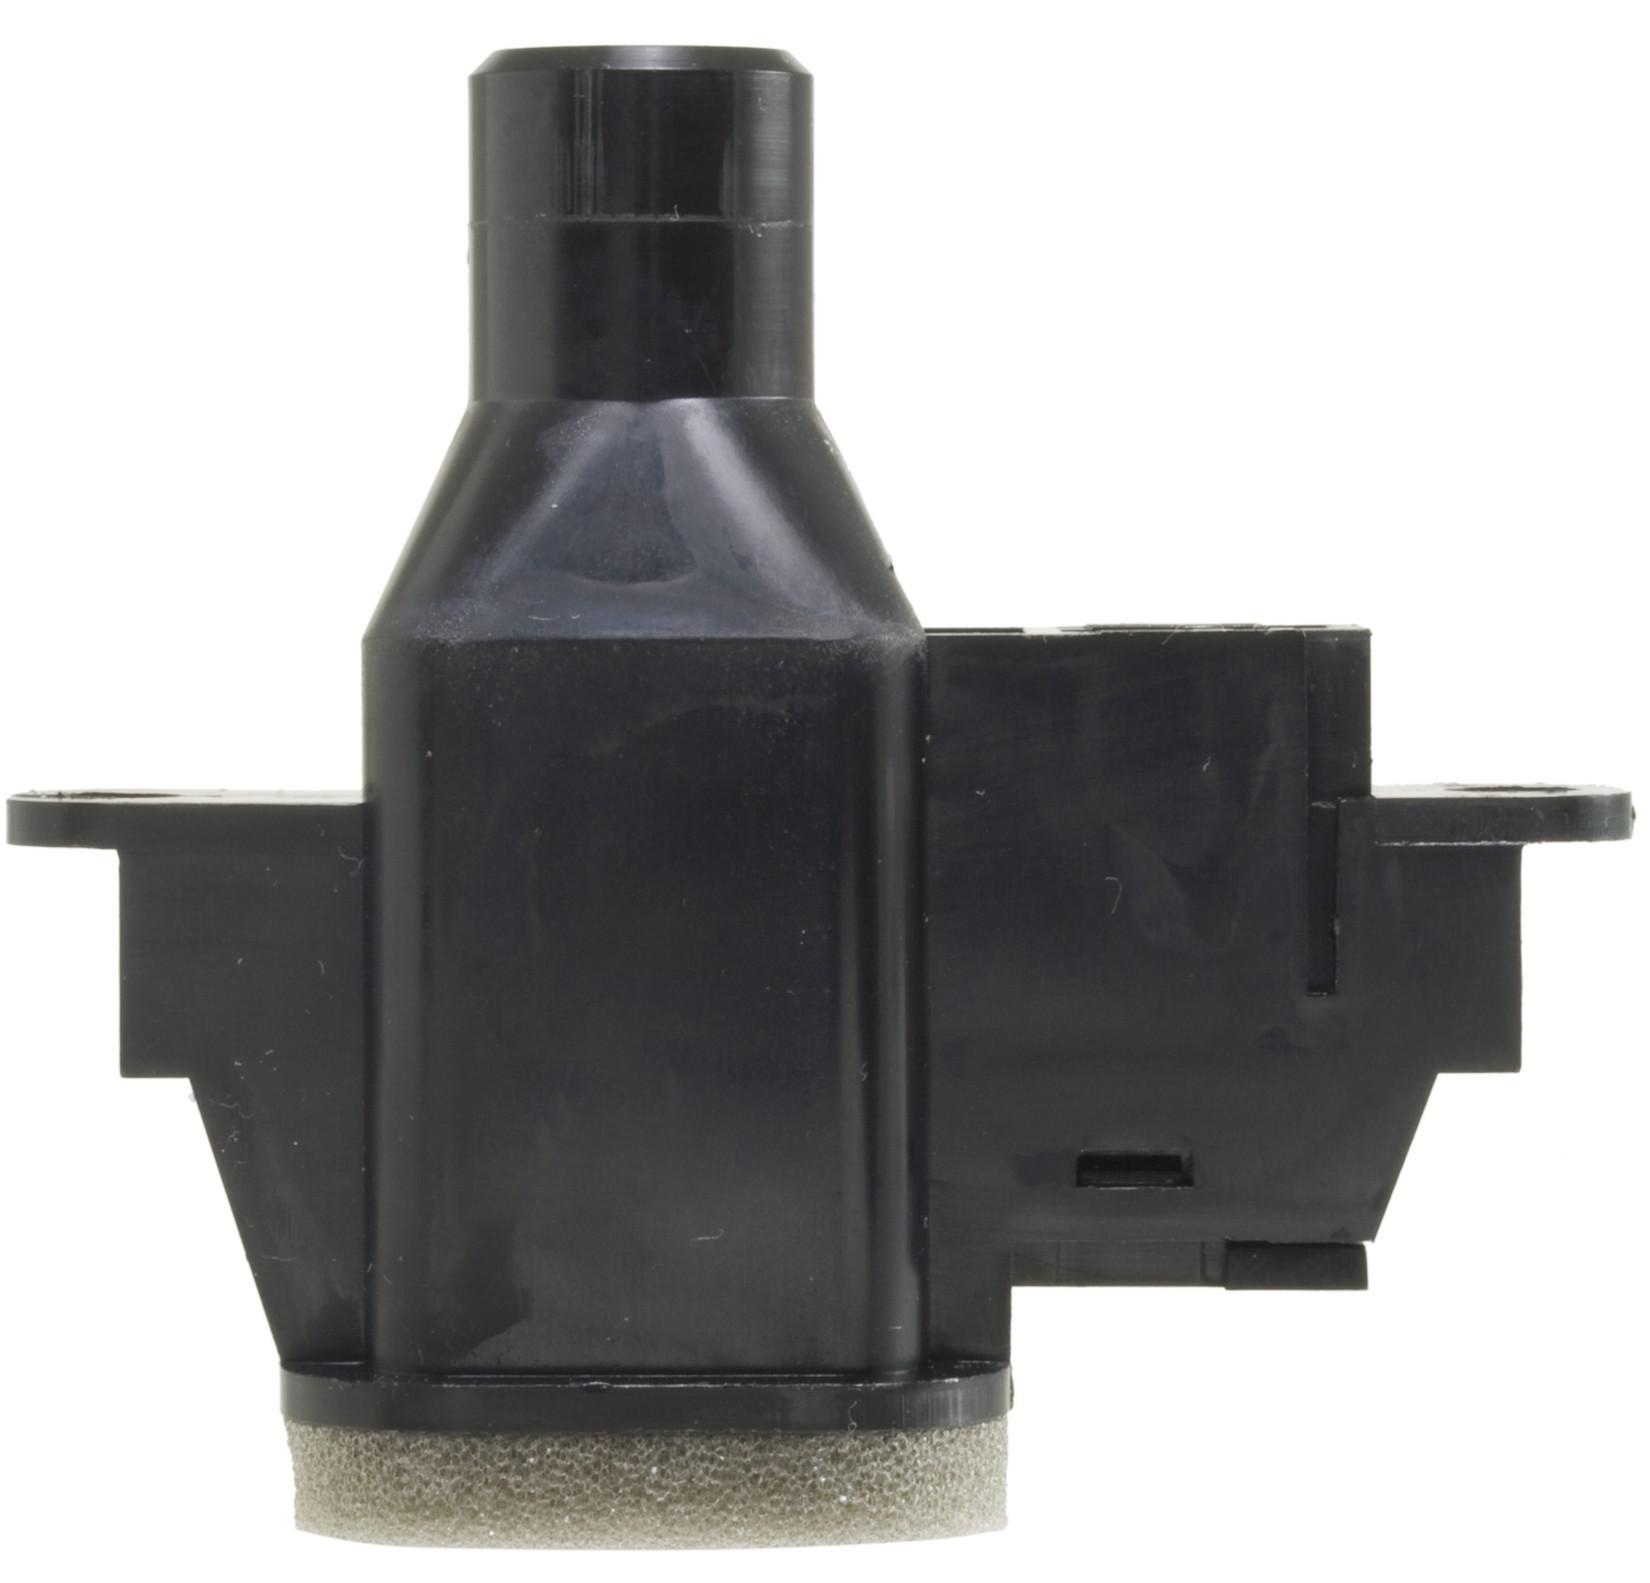 M14 1 5 Well For Temp Probe : Ambient air temperature sensor wells su fits